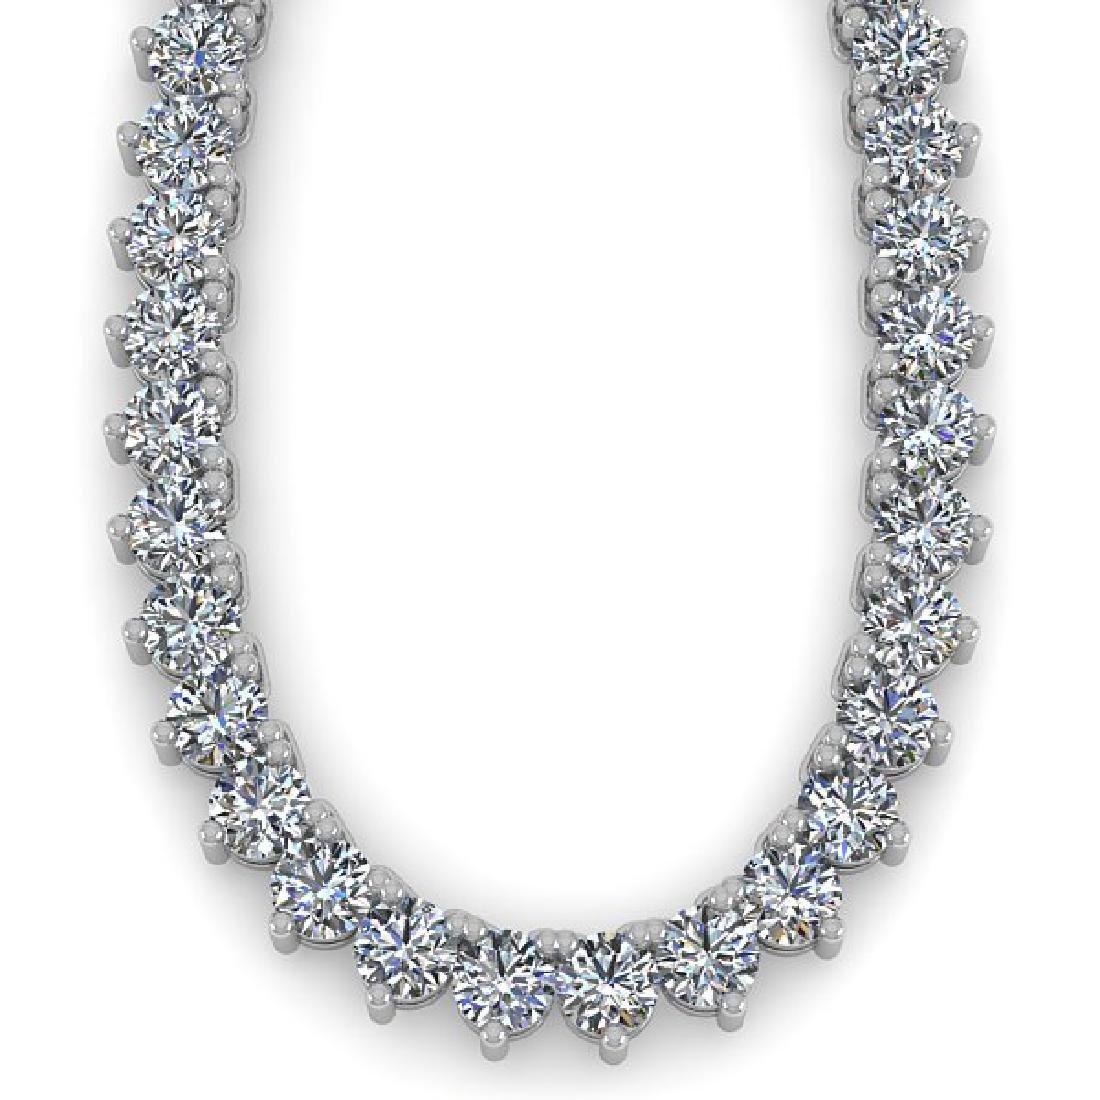 45 CTW Solitaire SI Diamond Necklace 14K White Gold - 2